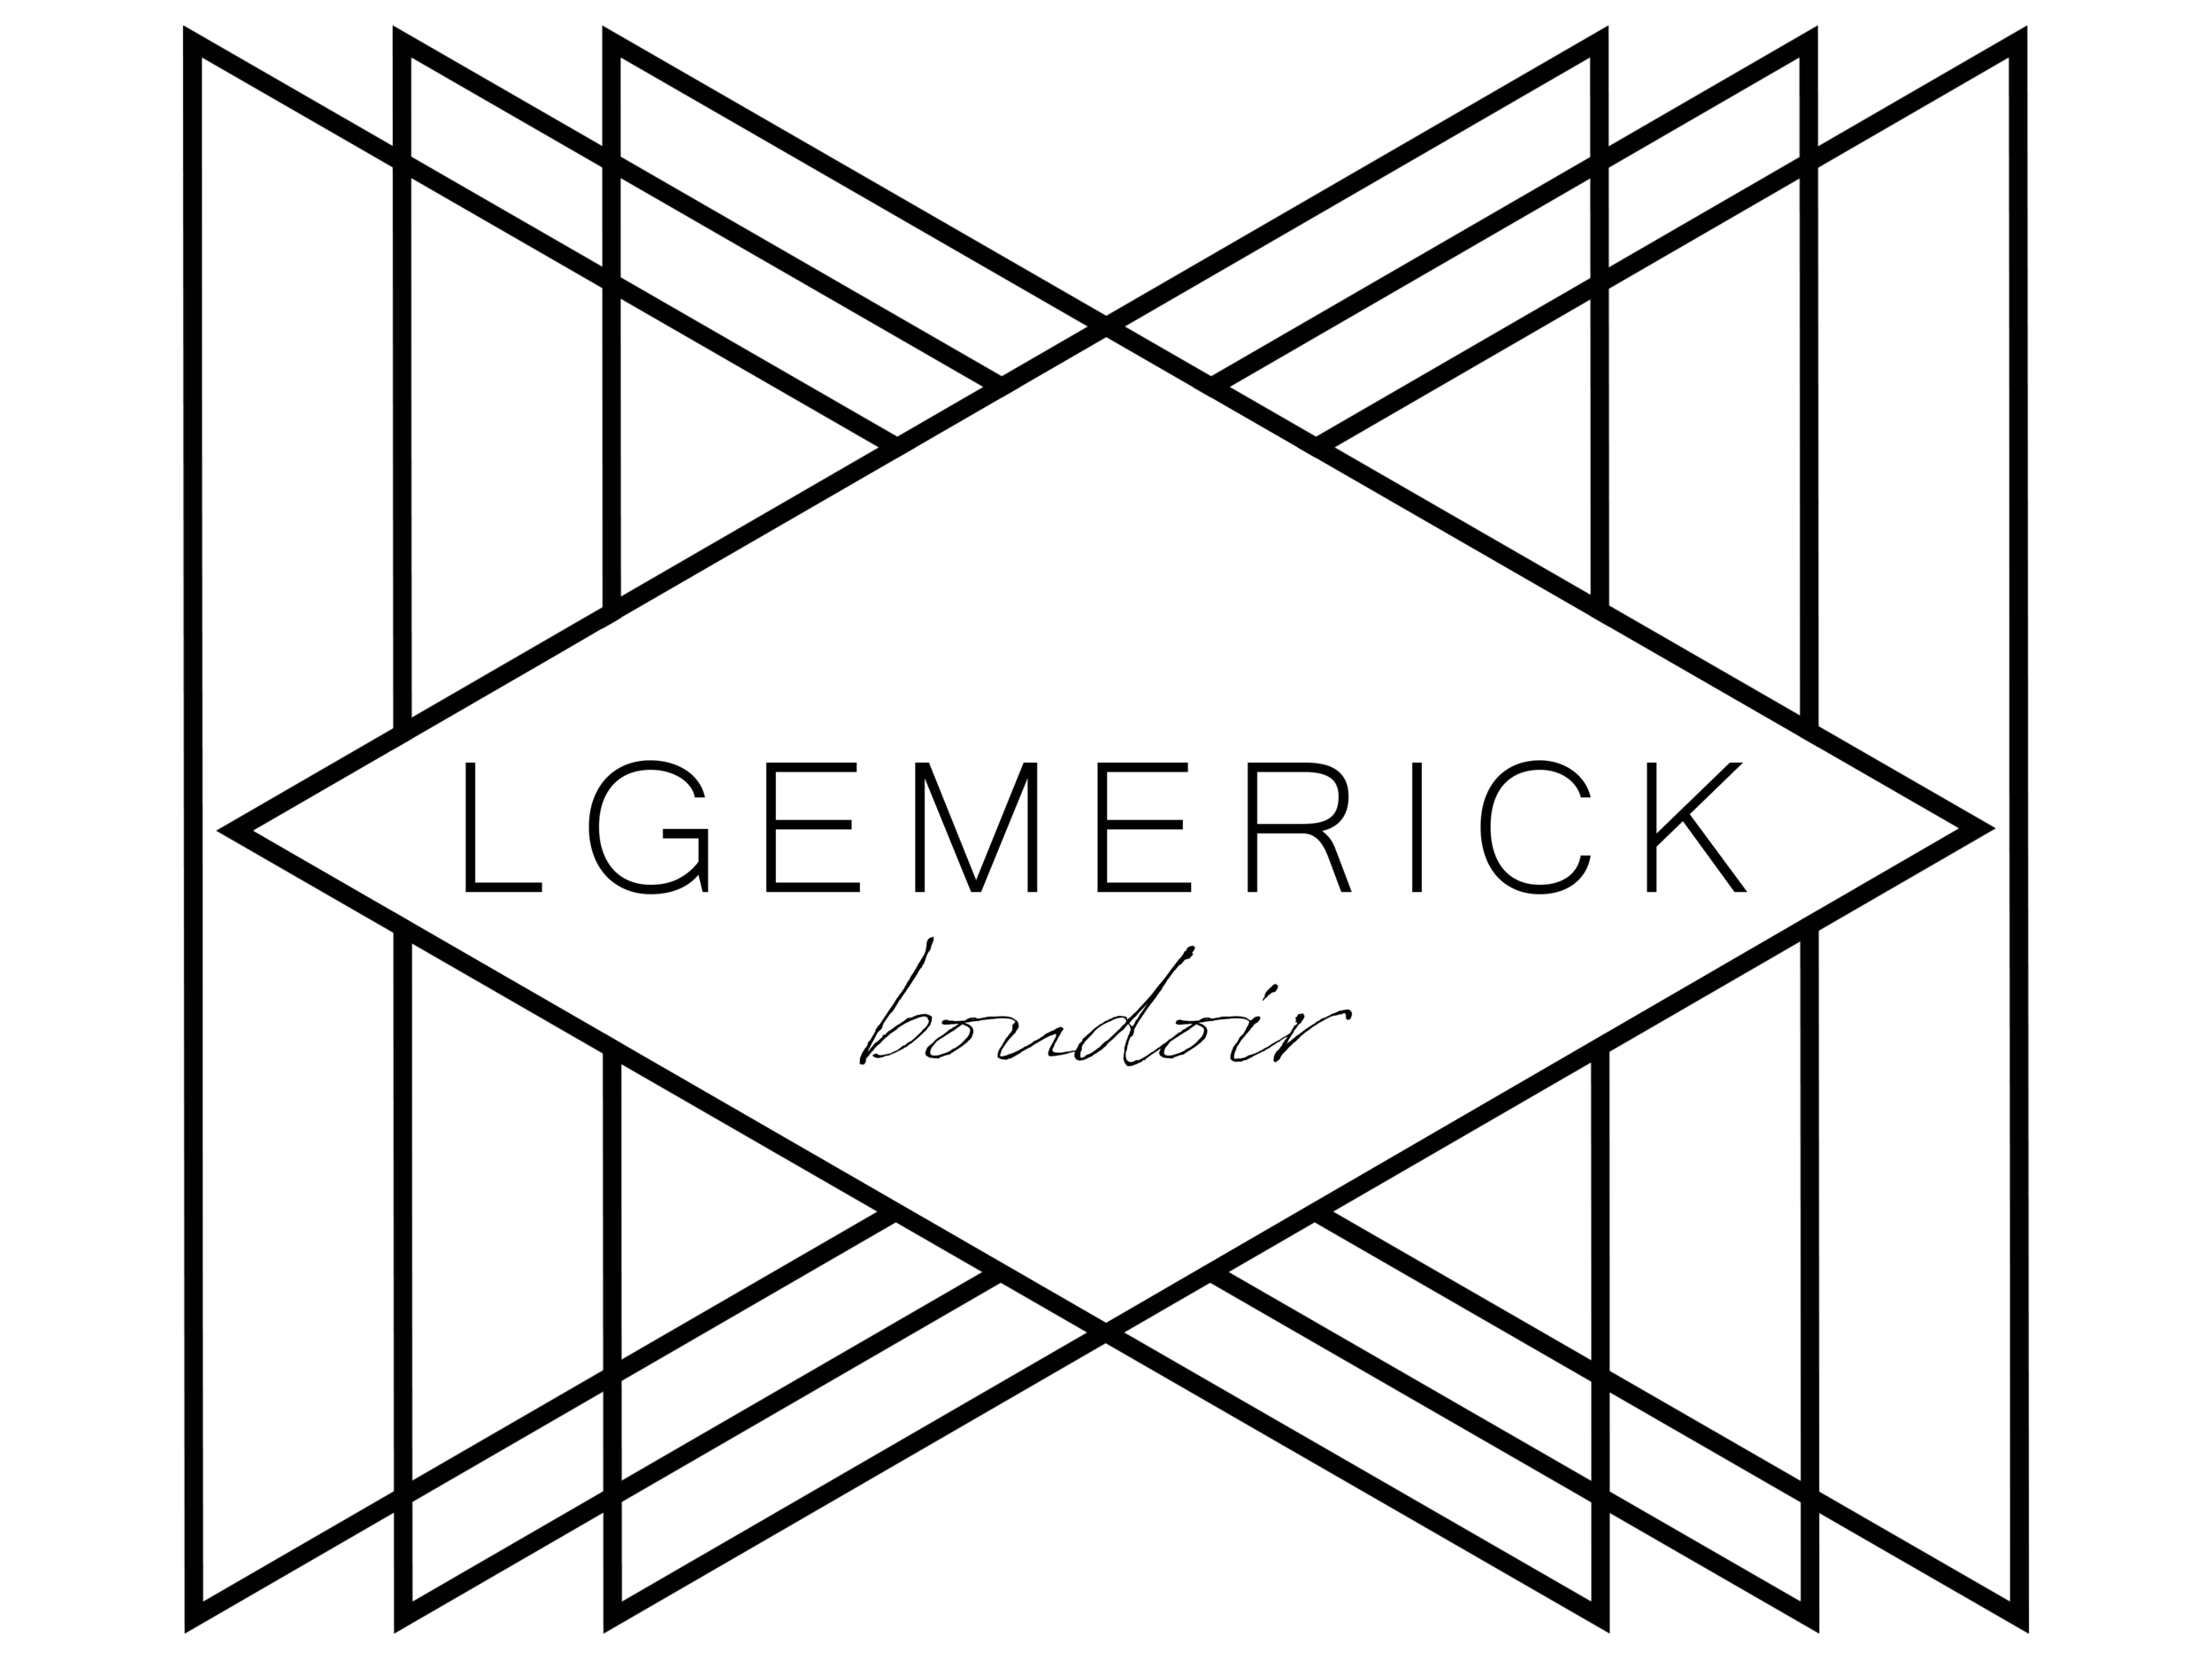 LARGE LOGO boudoir black on trans.png